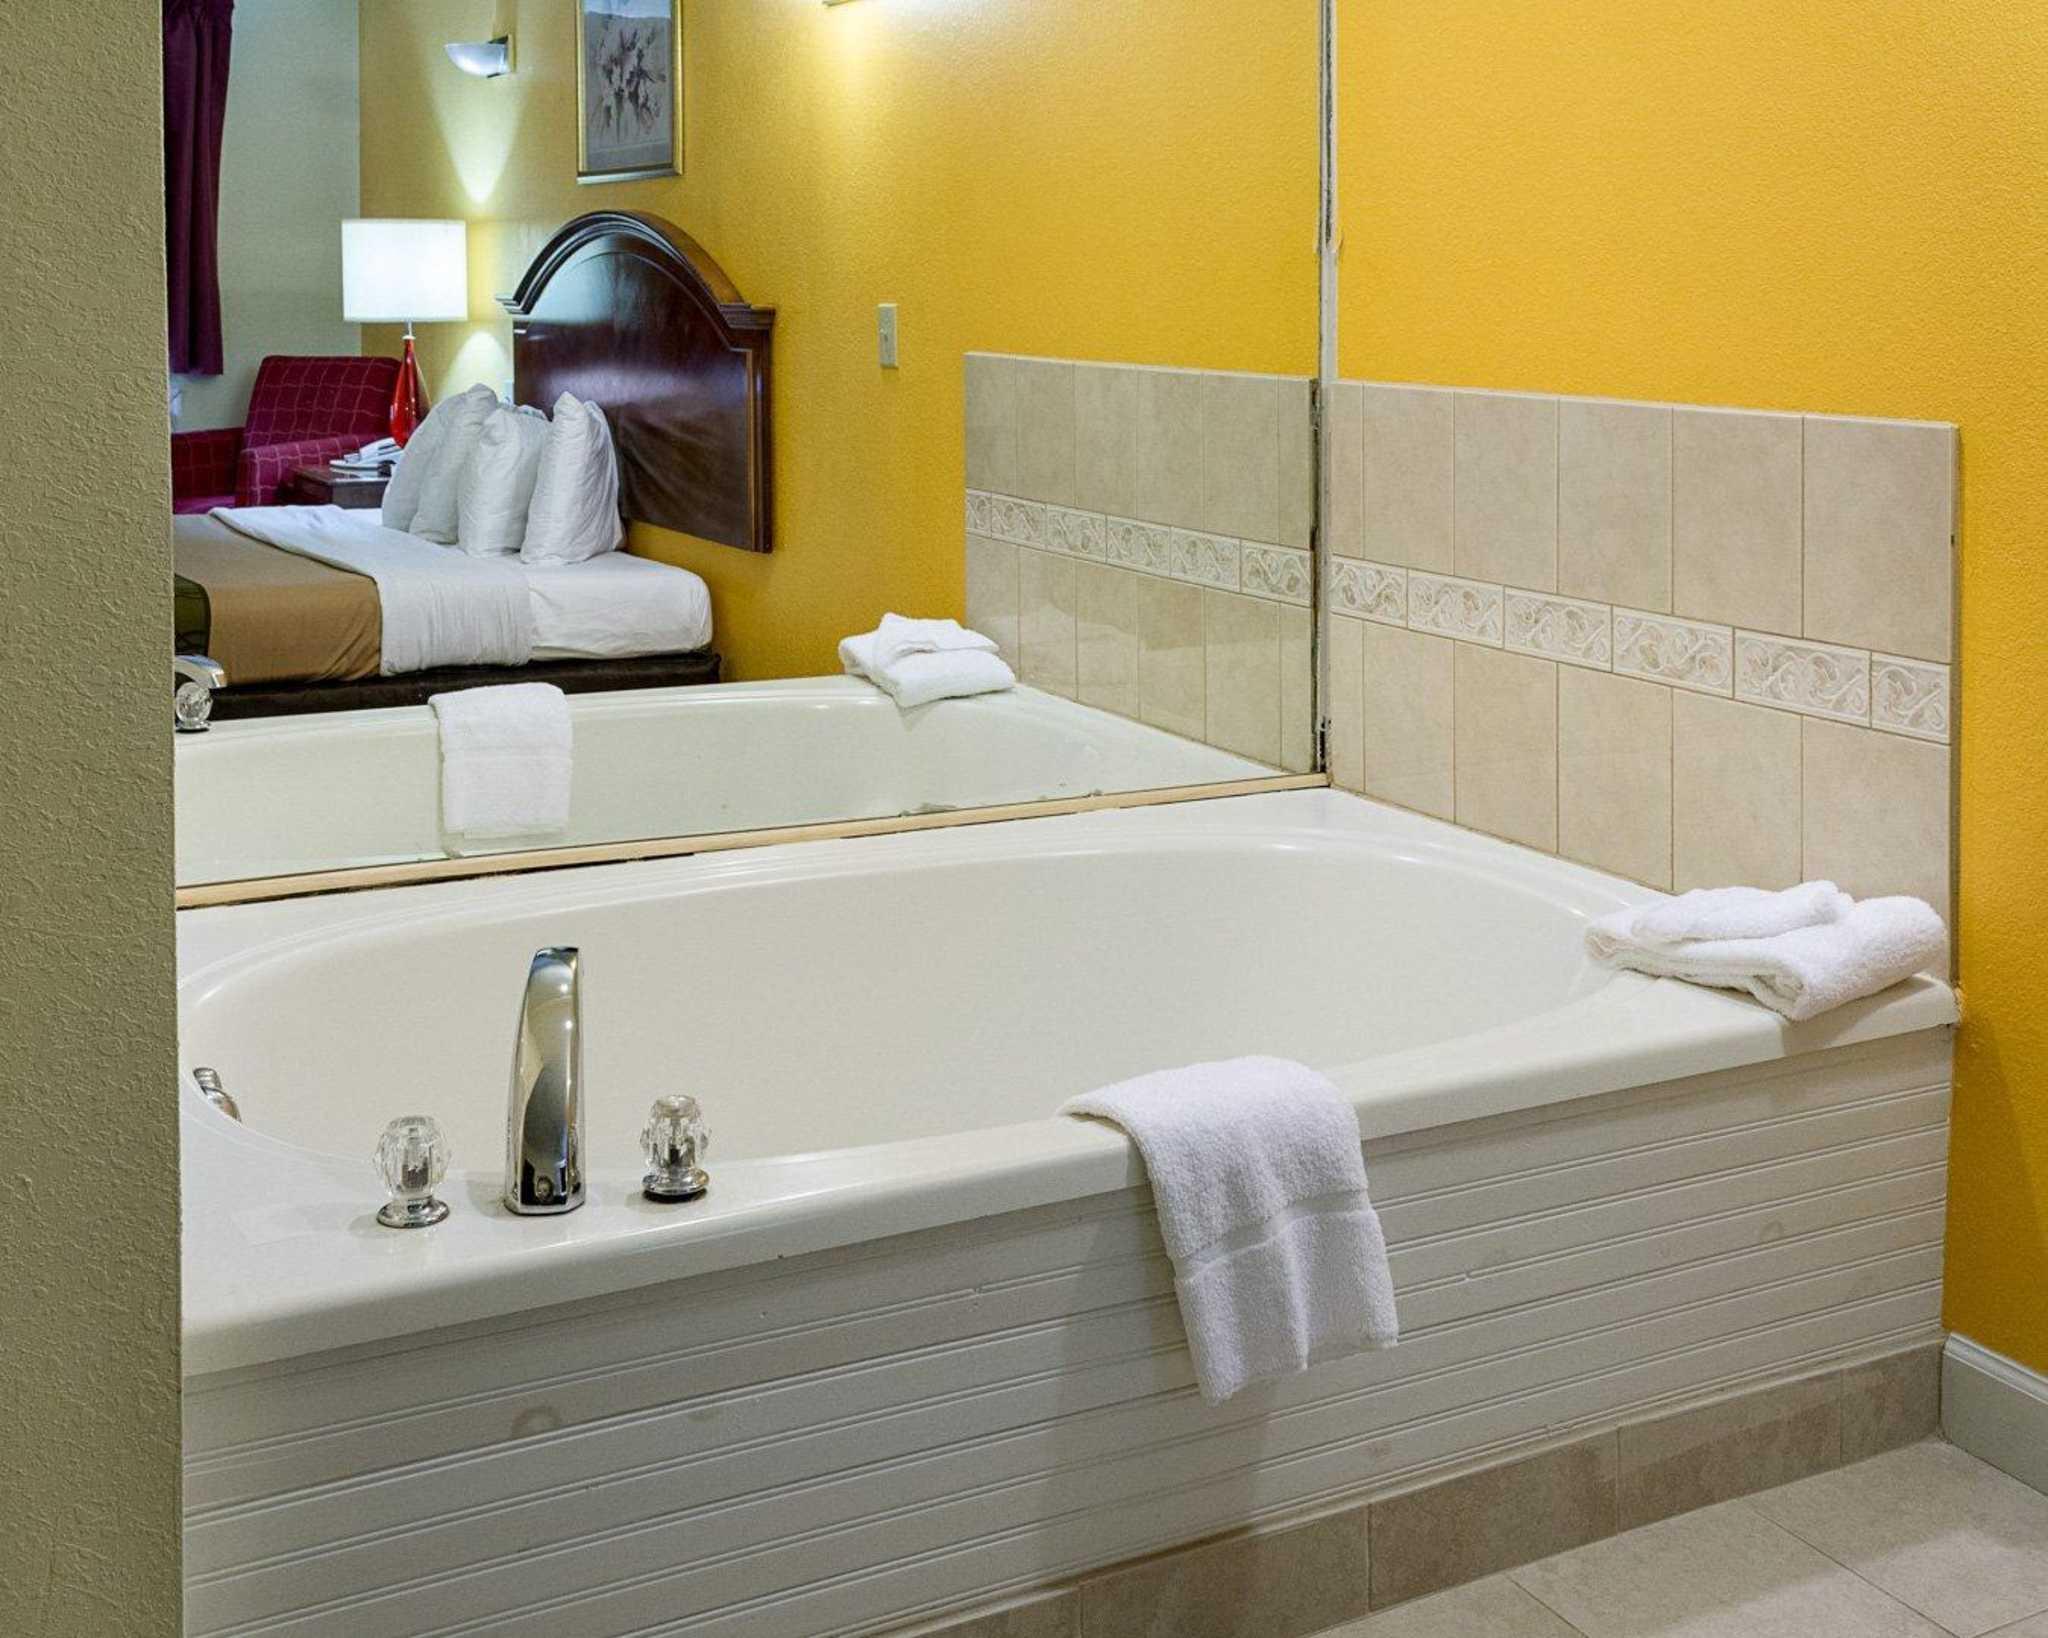 Econo Lodge Inn & Suites Carrollton Smithfield image 19